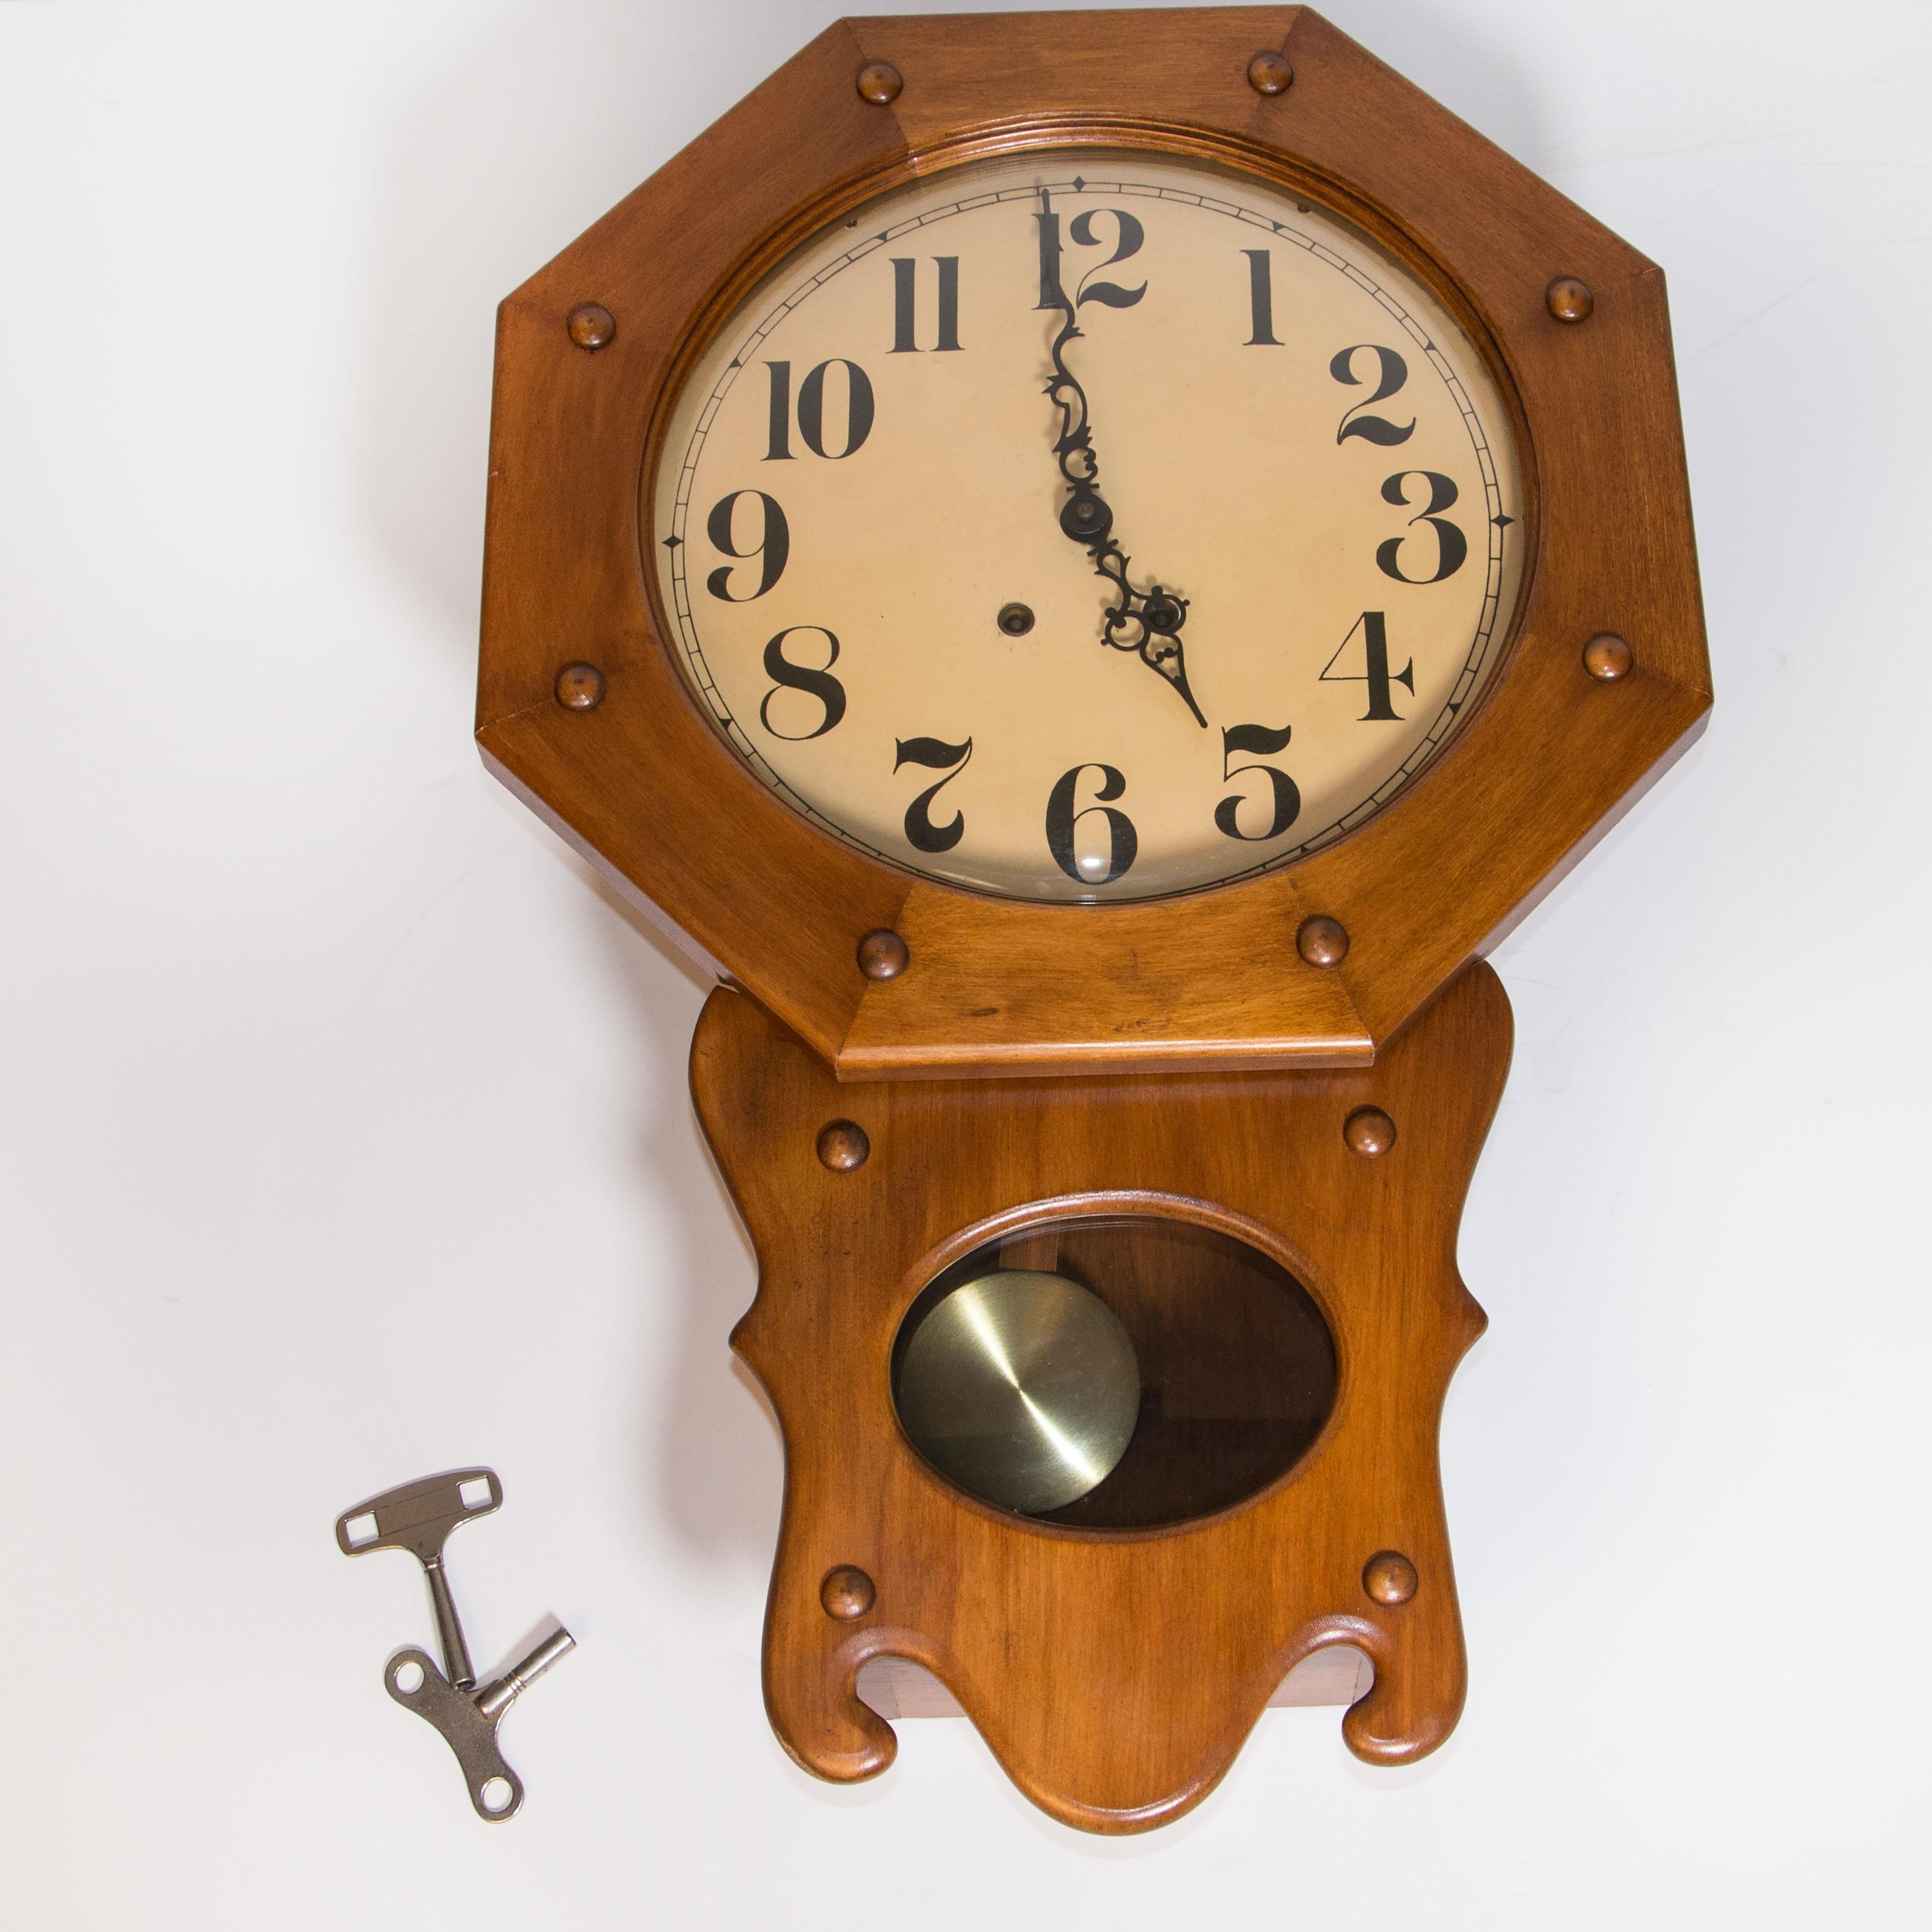 Wooden Octagon Regulator Wall Clock